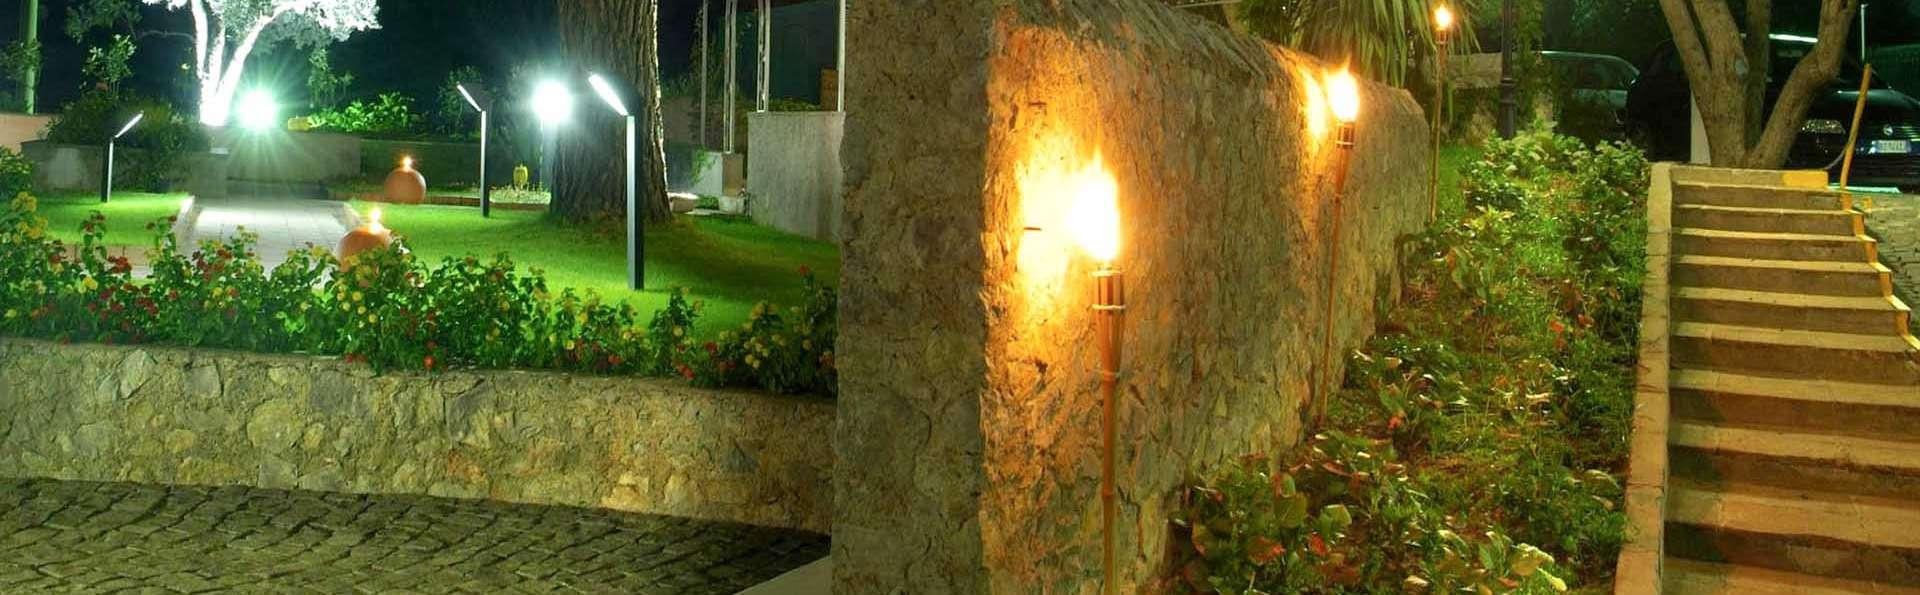 Hotel Baia - EDIT_HM-gardennight_01.jpg